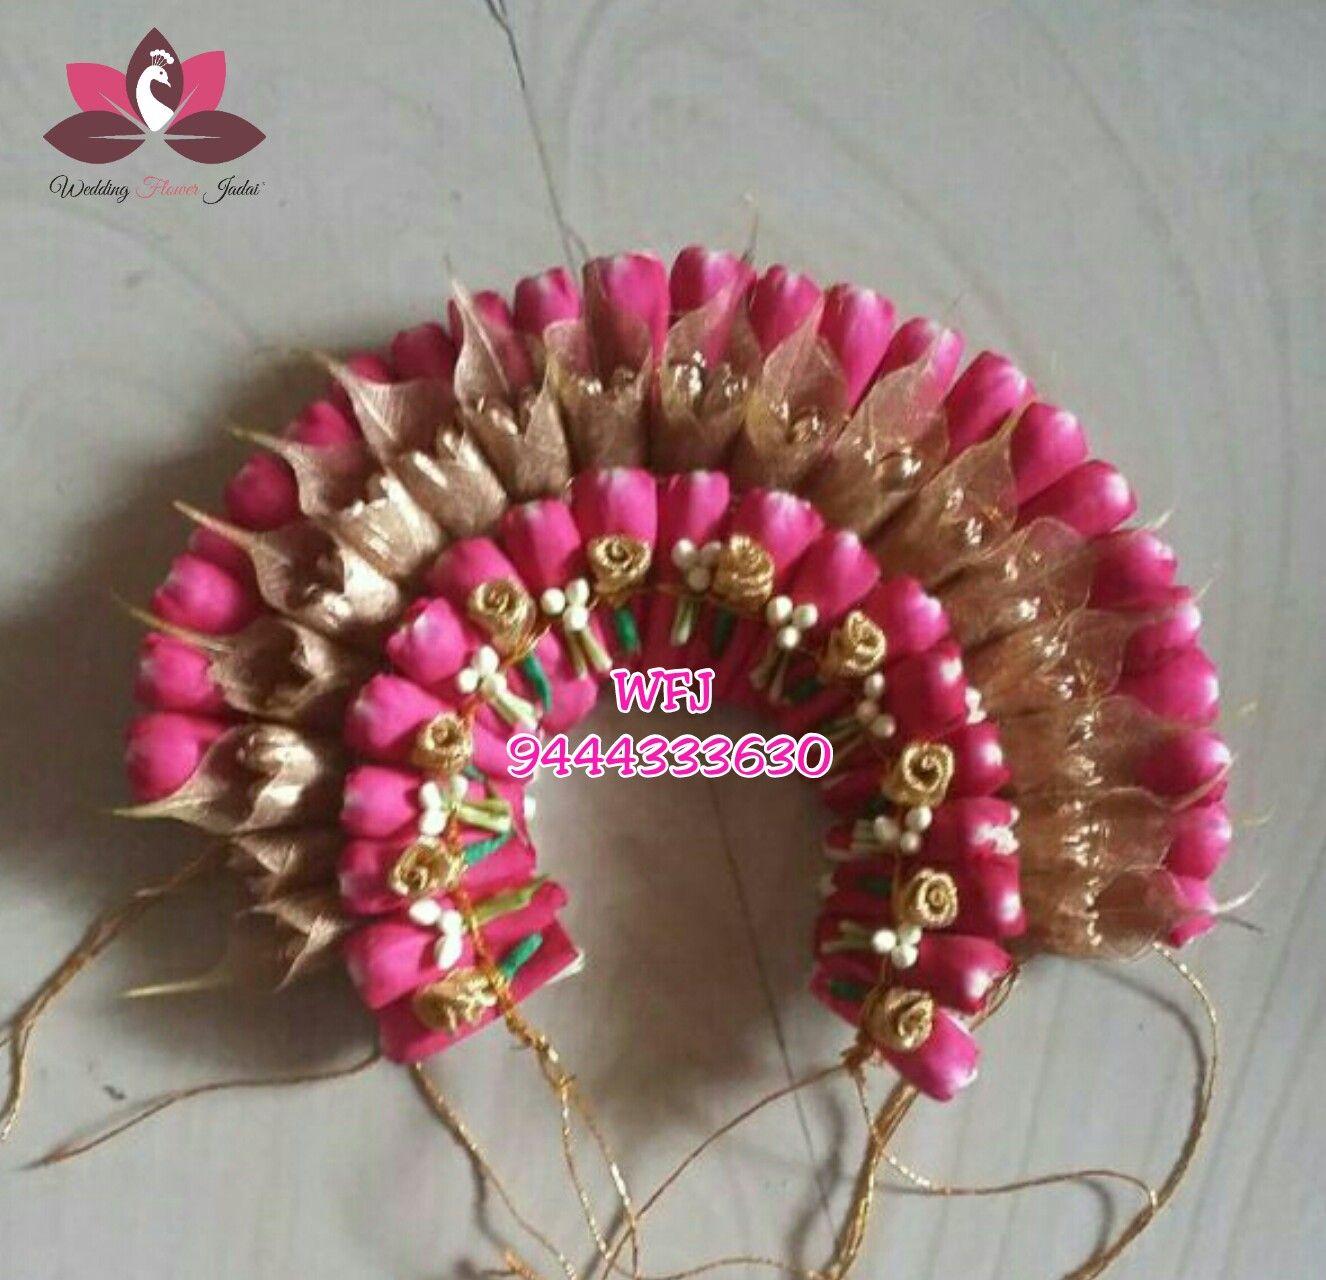 Wedding Flower Jadai Jadai Veni Collections T Wedding